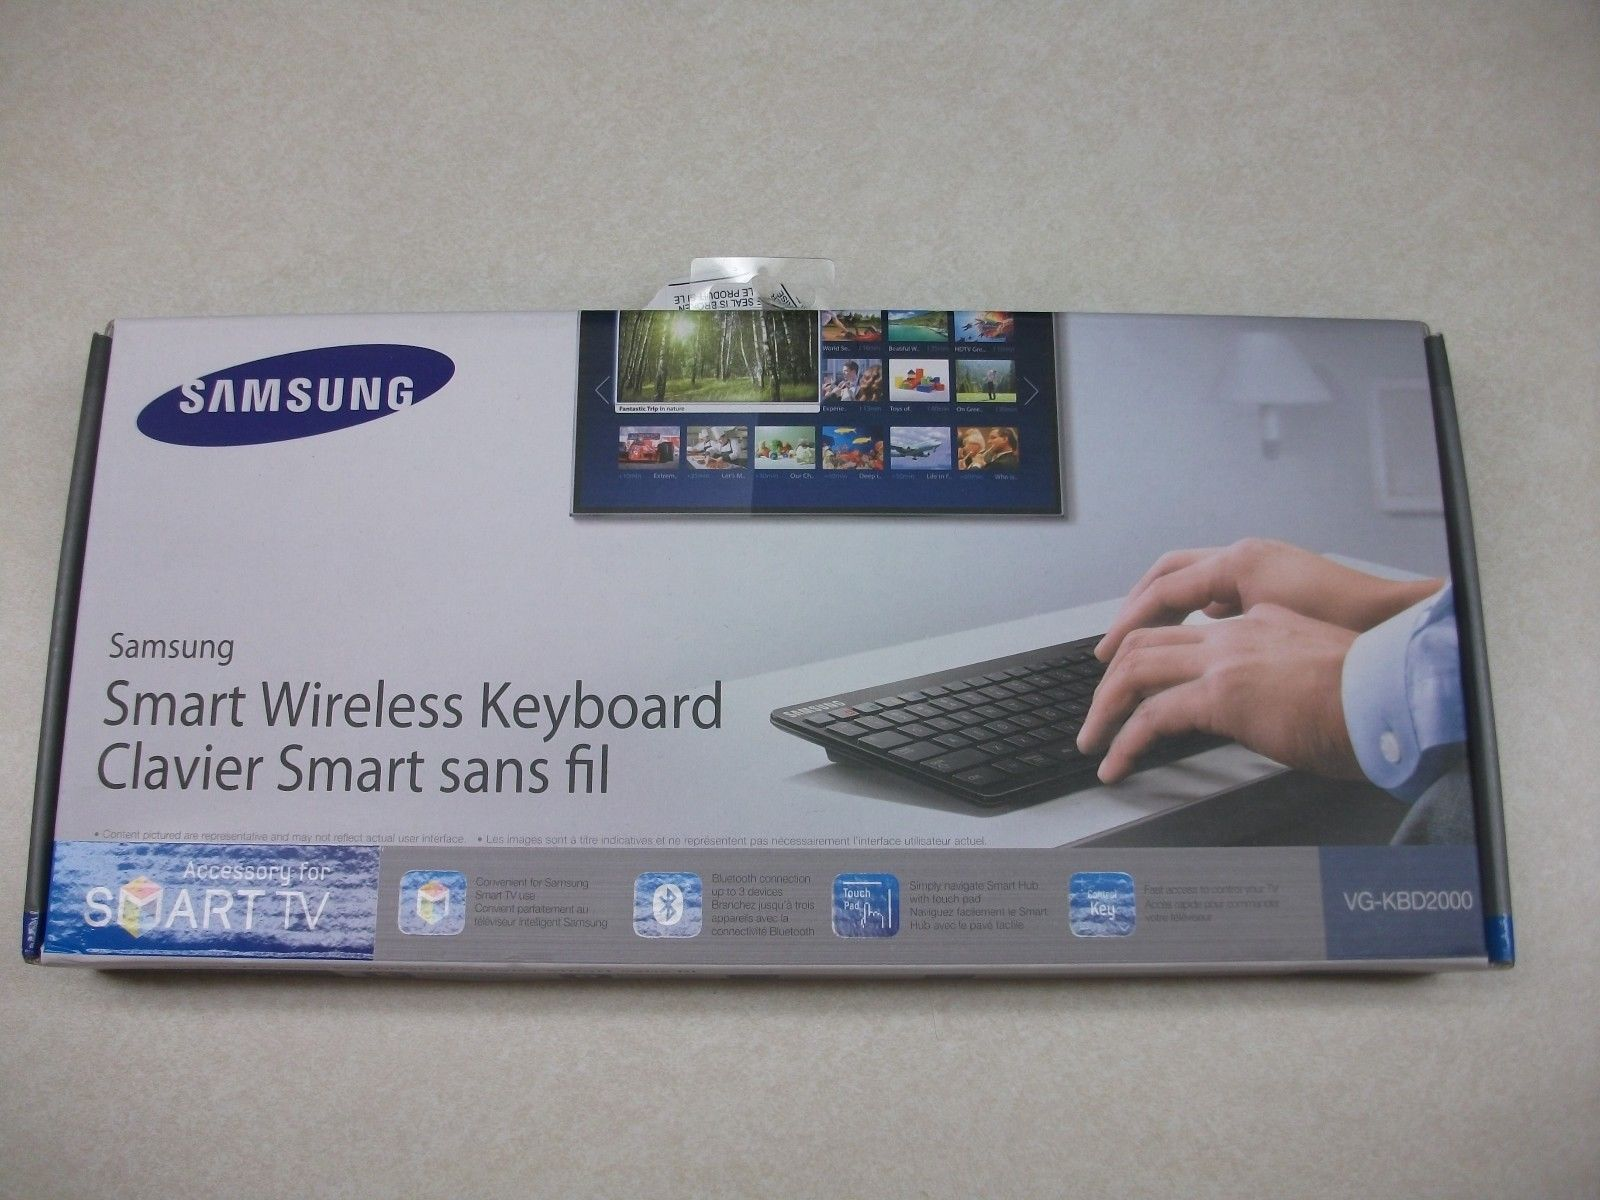 Samsung VG-KBD2000 Wireless Keyboard Samsung Smart TVs (eBay Link)